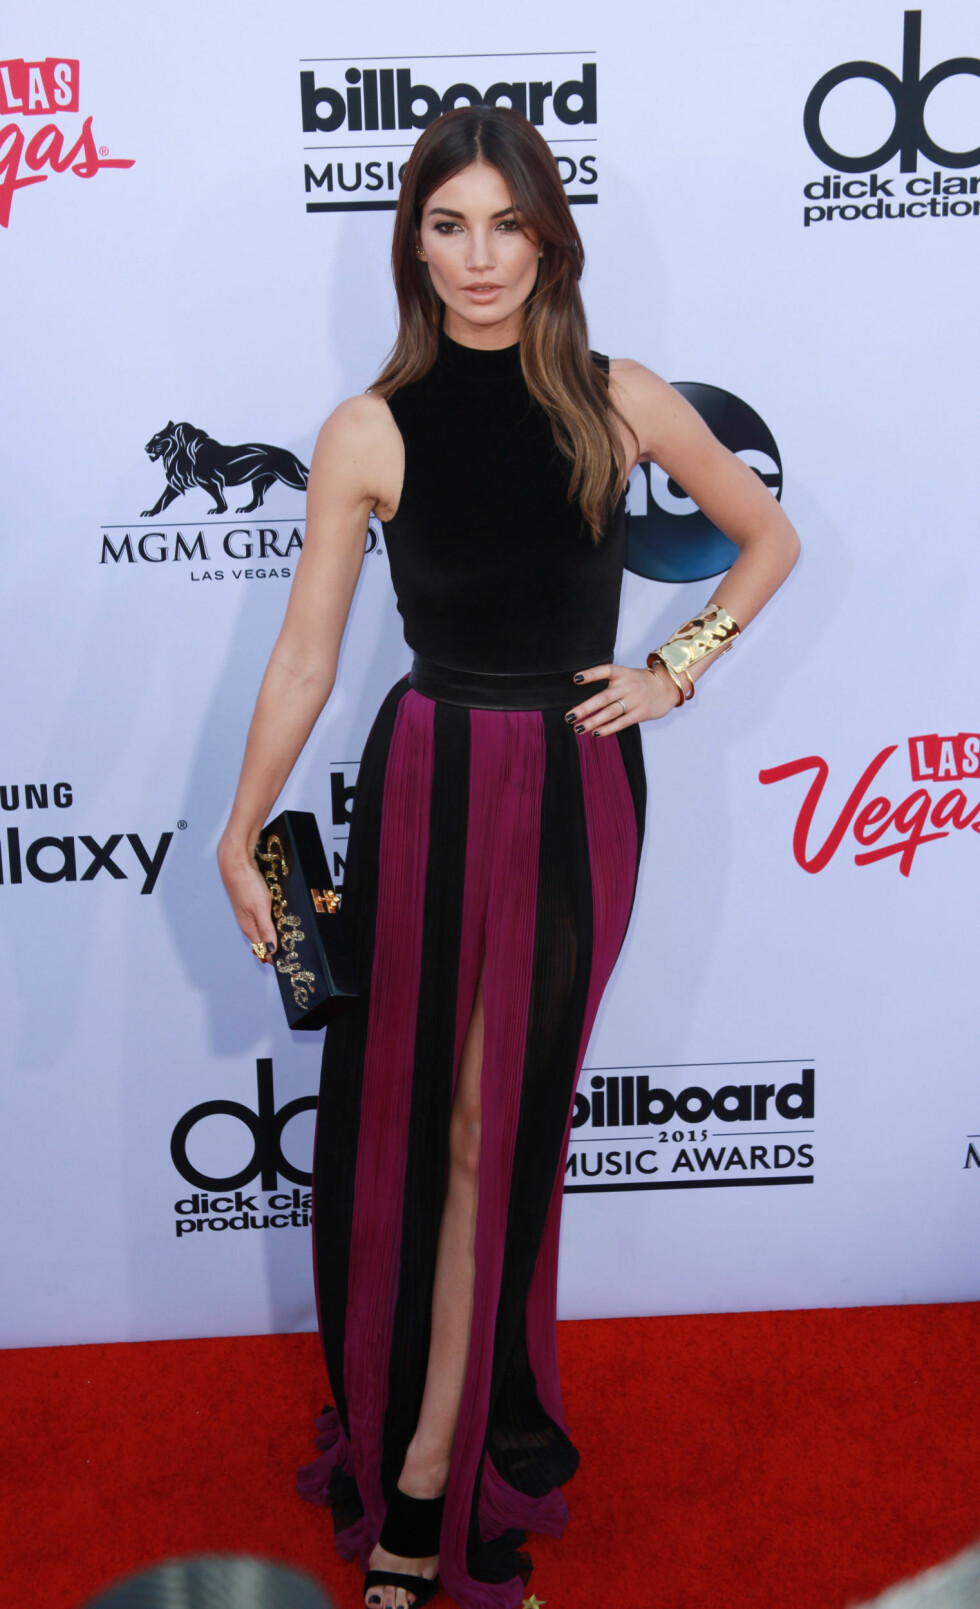 SORT OG LILLA: Victoria's Secret-modellen Lily Aldridge kom også i kjole fra Balmain. Foto: Zuma Press Scanpix